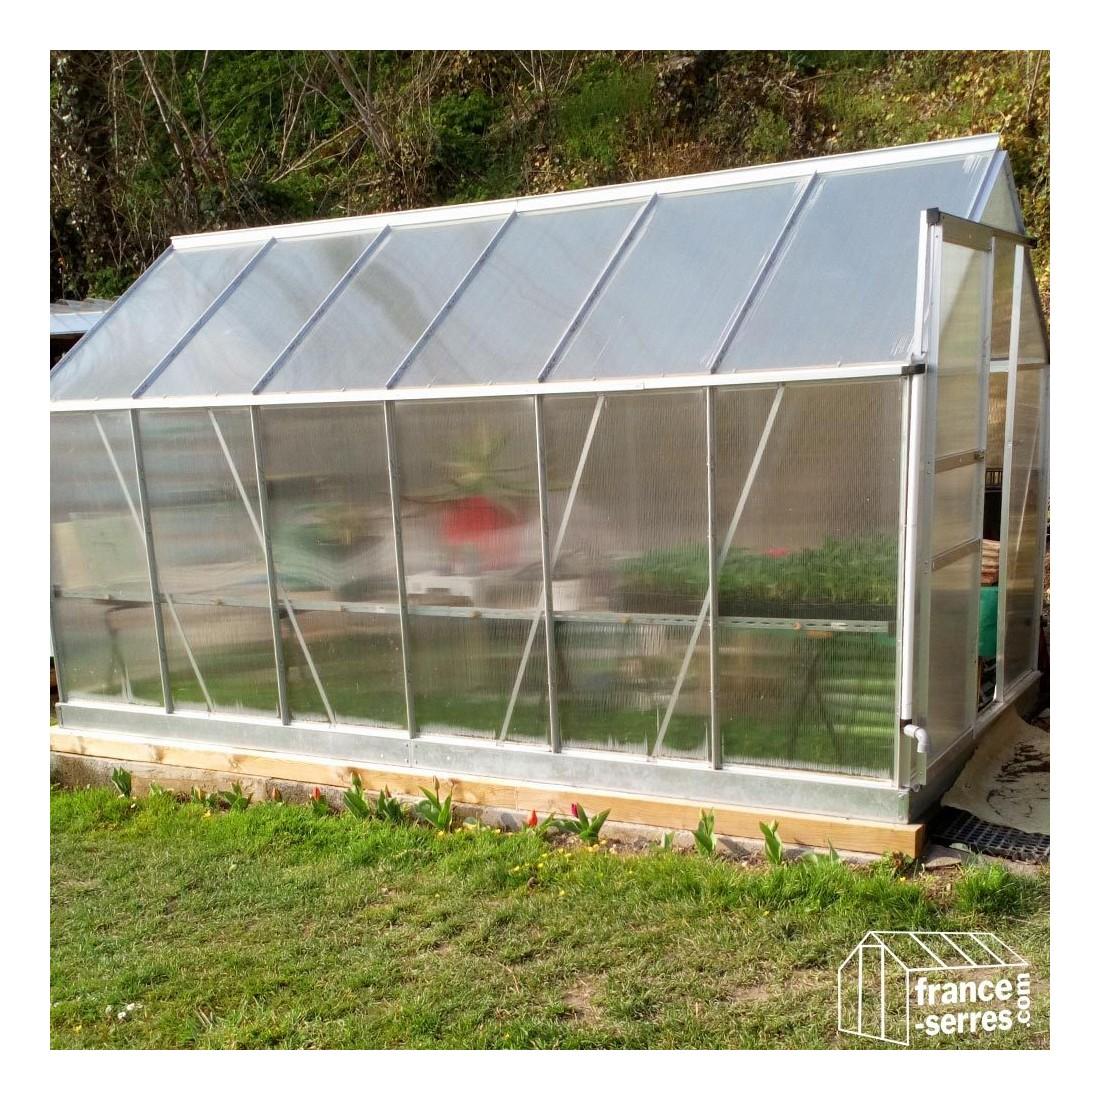 Serre de jardin en aluminium et en polycarbonate - Plaque polycarbonate pour serre jardin ...